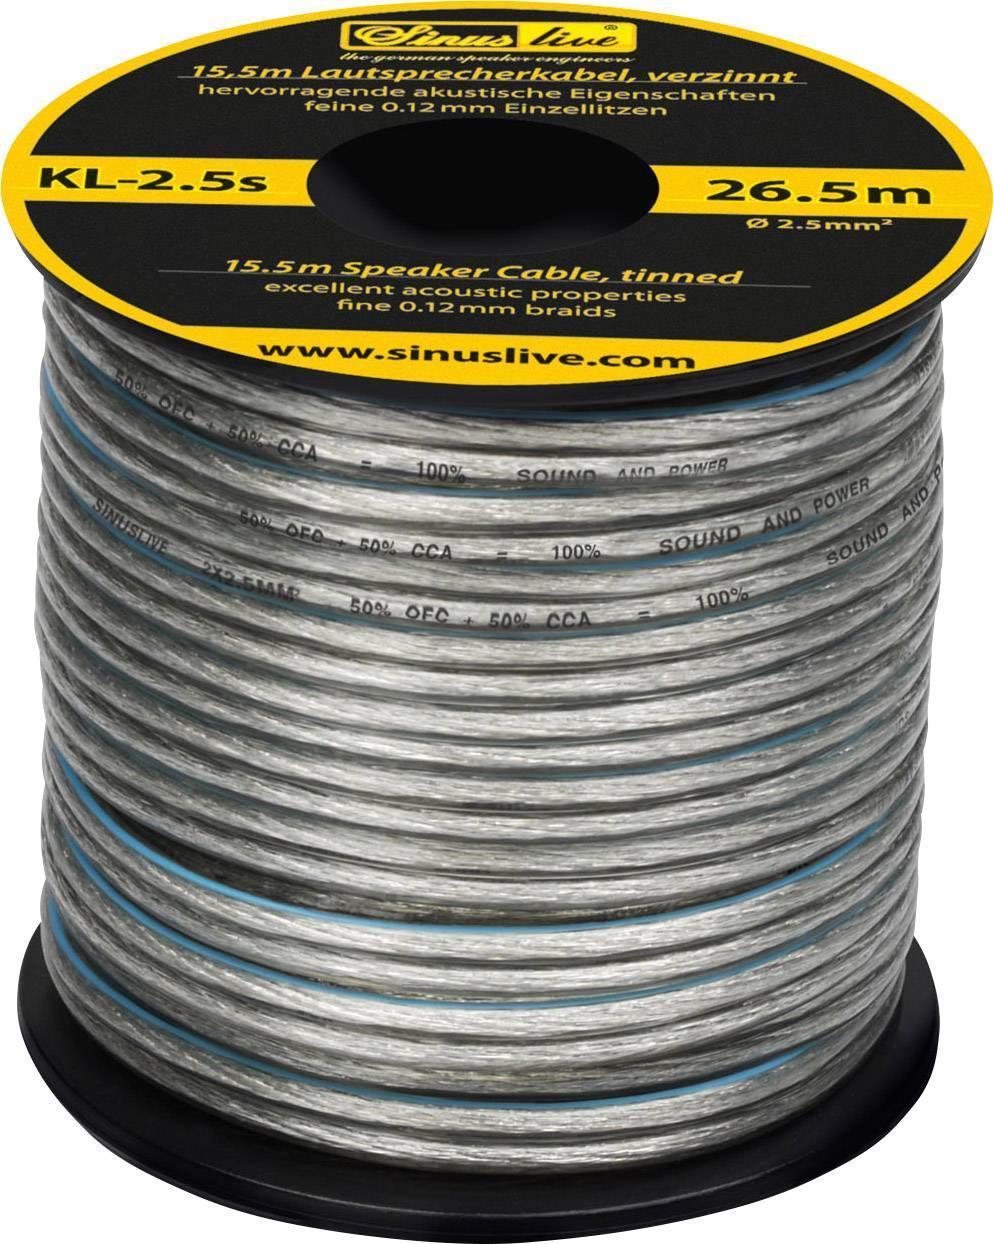 Reproduktorový kabel Sinuslive KL-2,5S, 1 x 2.50 mm², stříbrná, 15.5 m